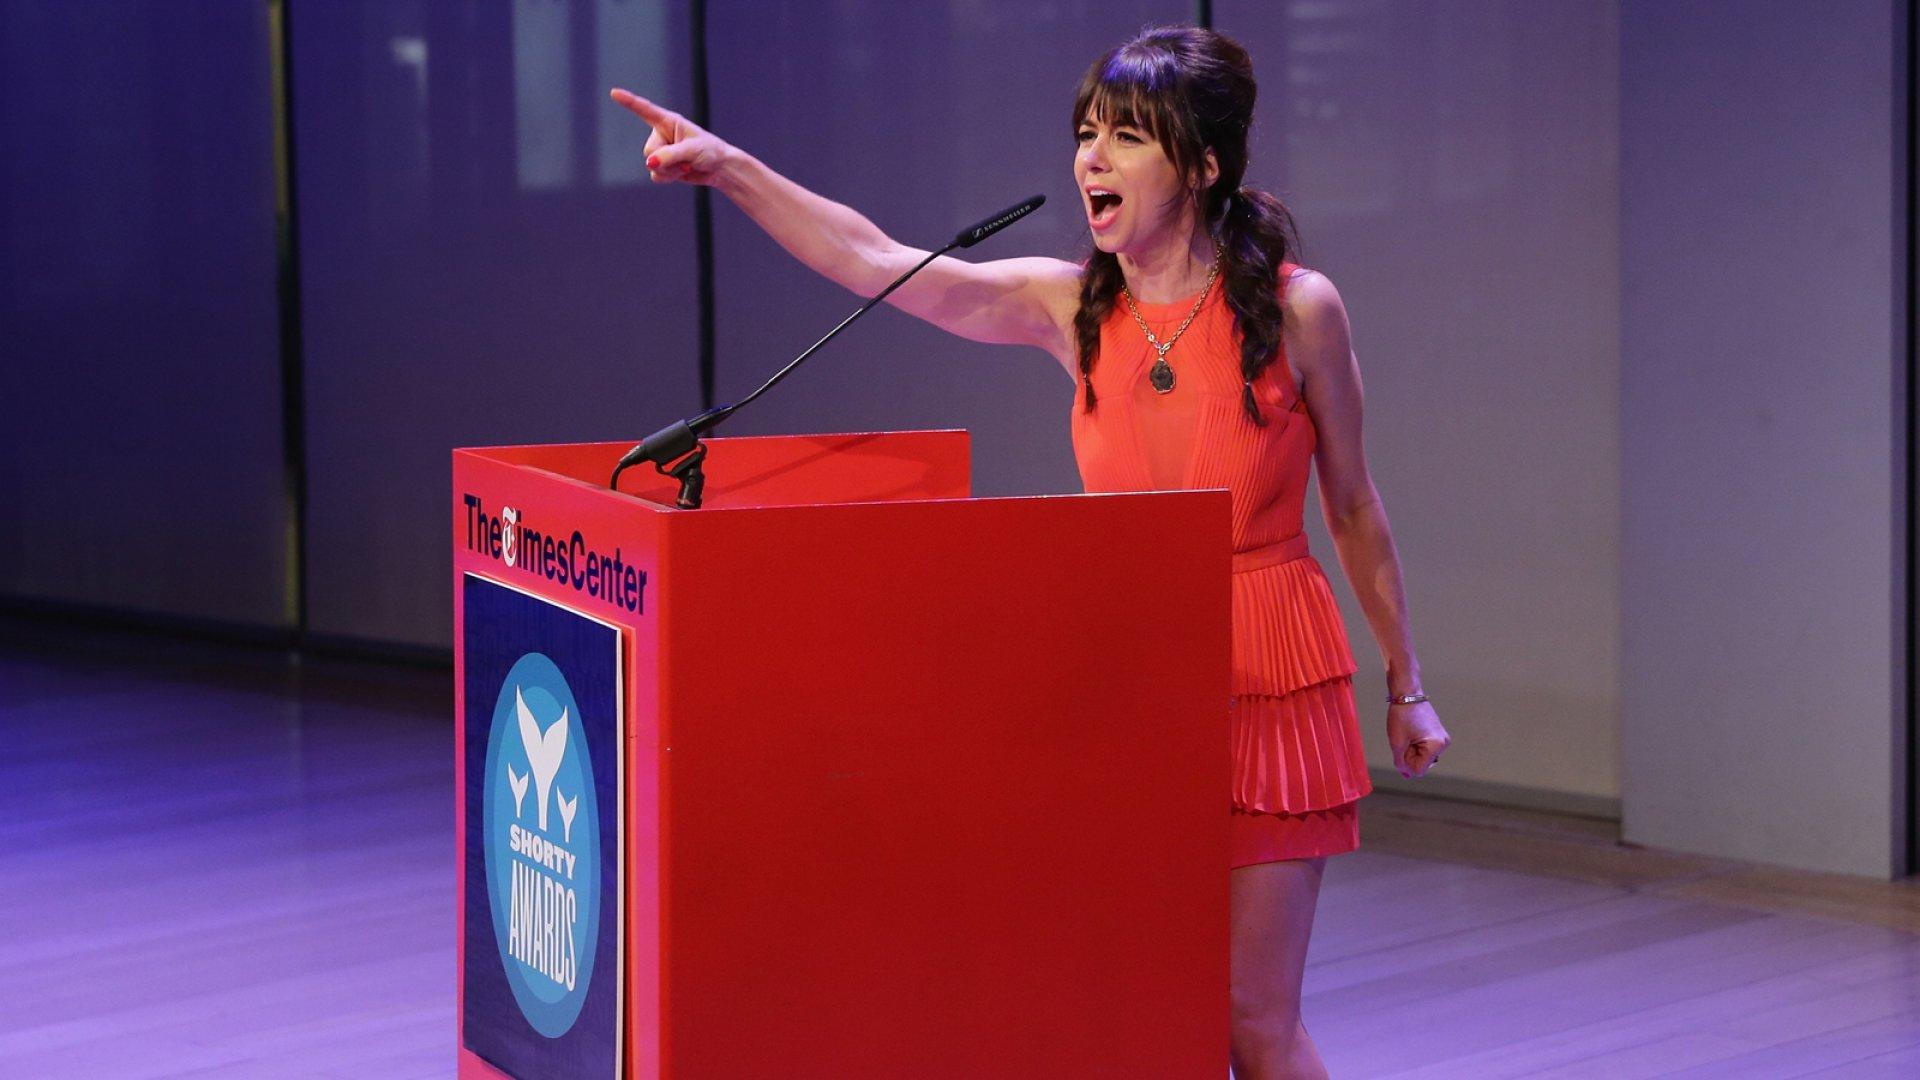 The Shorty Awards Honor Social Media's Role Models